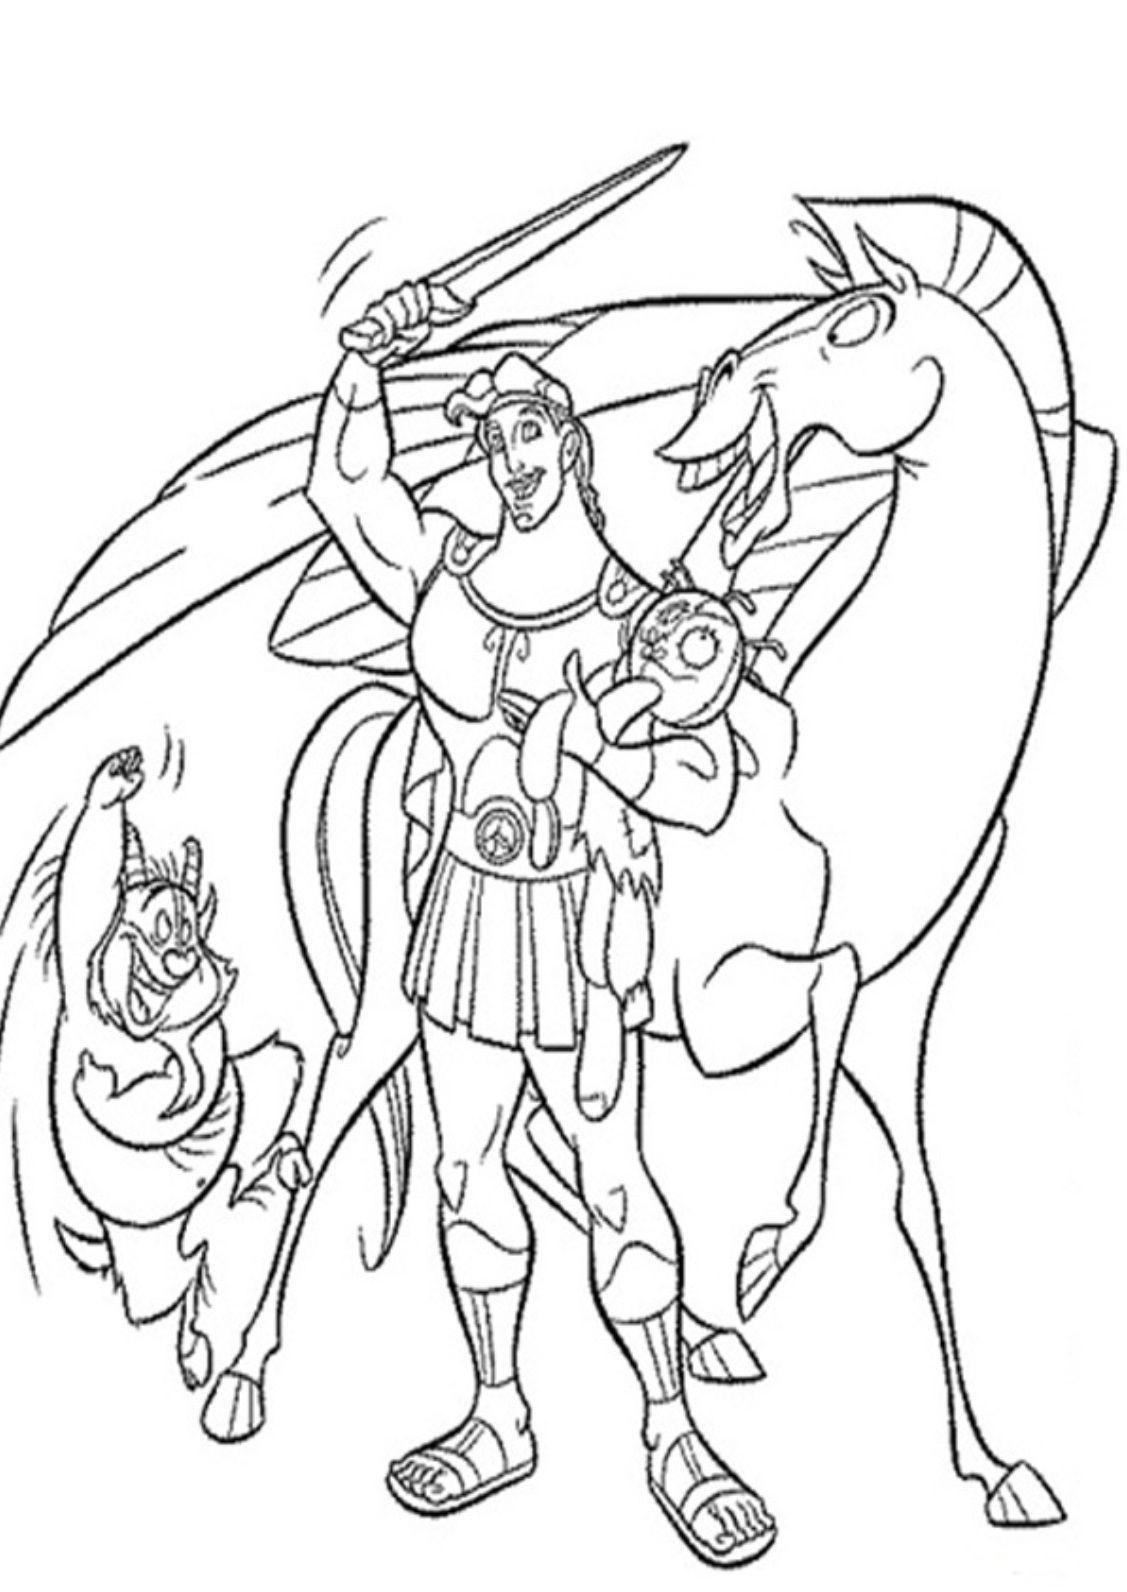 Hercules Win Coloring Pages For Kids #d22i : Printable Hercules